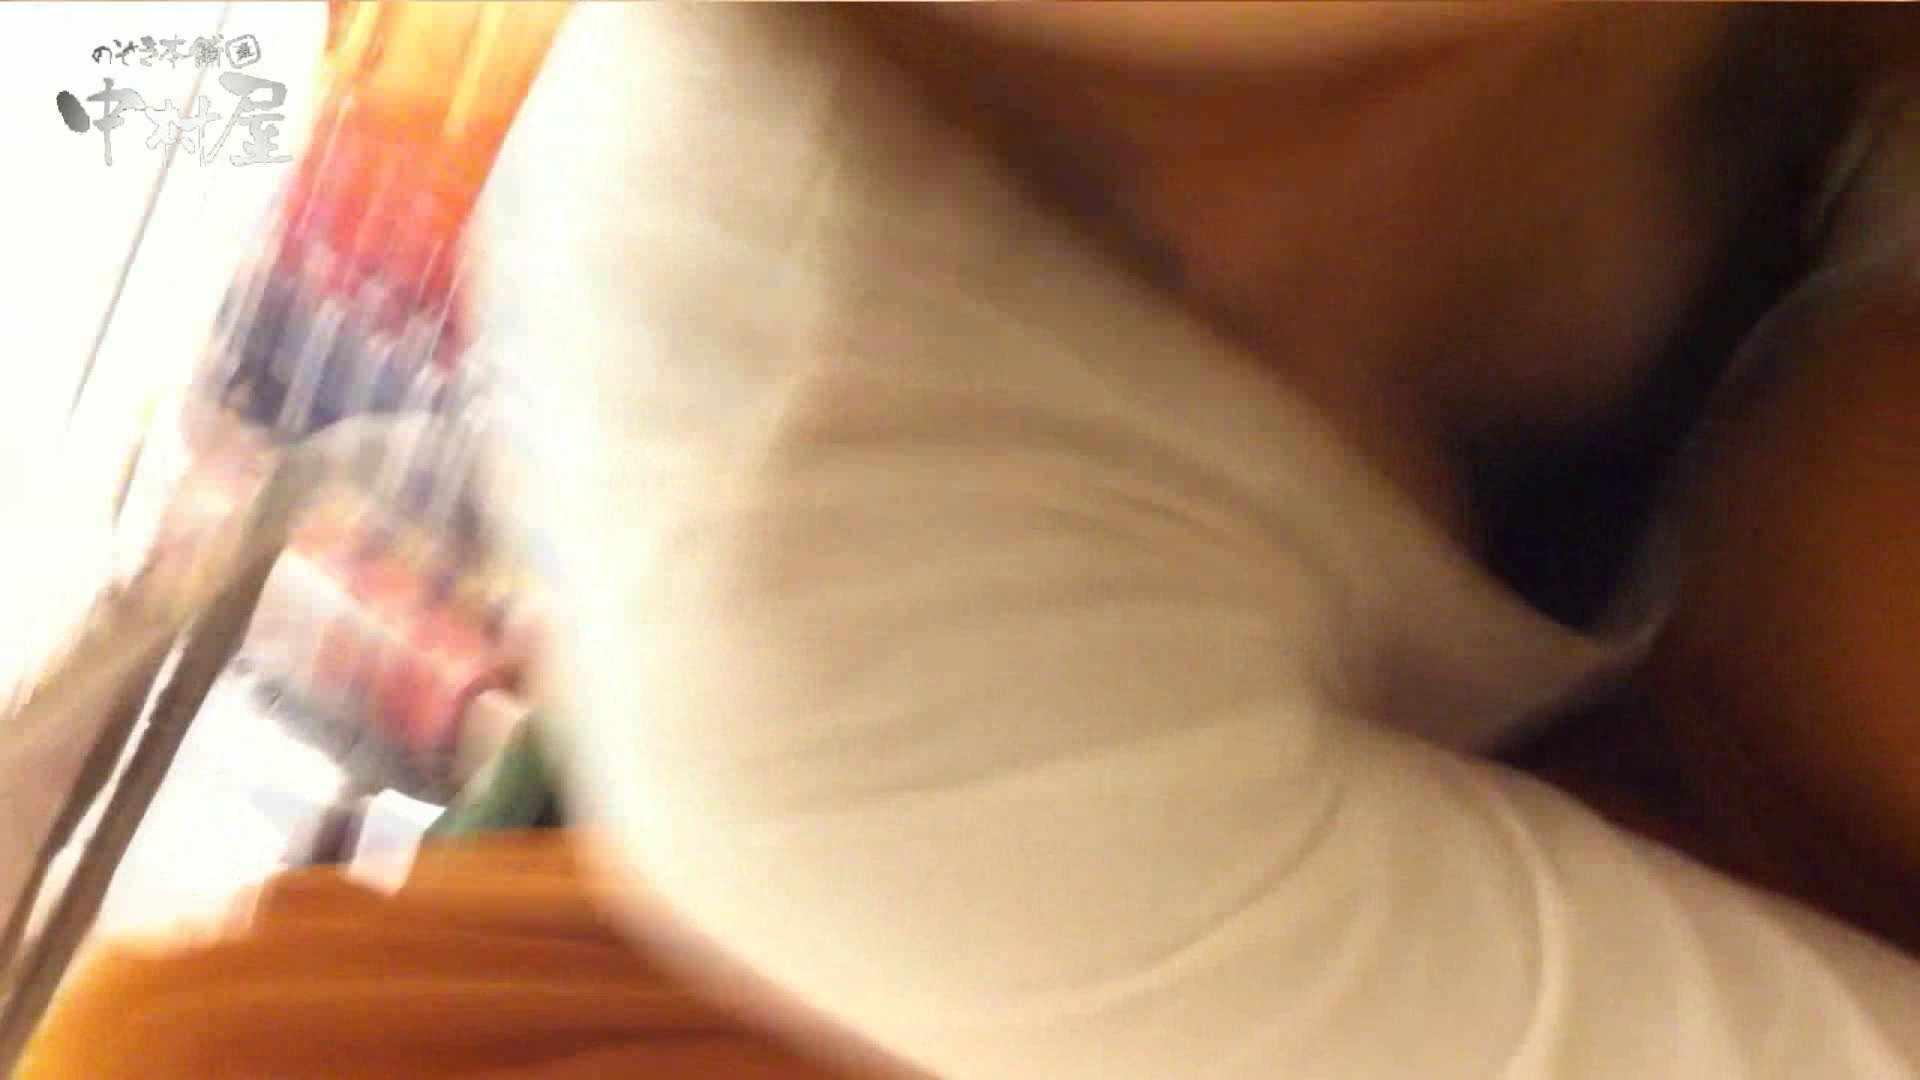 vol.84 美人アパレル胸チラ&パンチラ 帽子オネェさんに胸元アタック! チラ 盗撮オマンコ無修正動画無料 51PICs 28